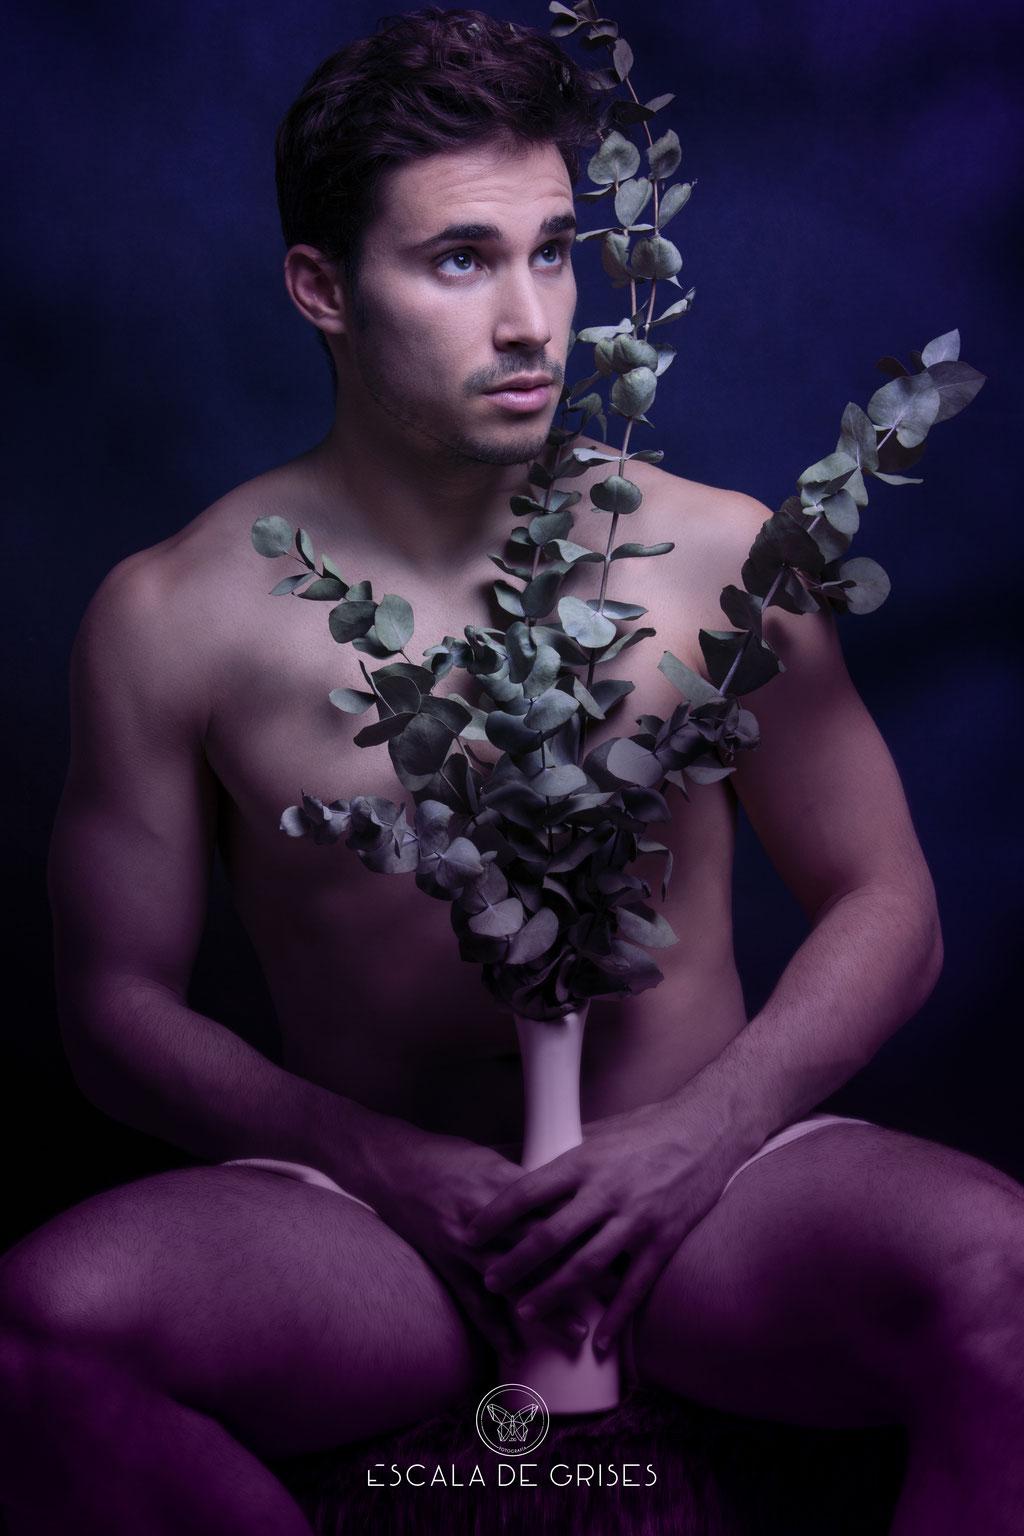 www.edgfotografia.com